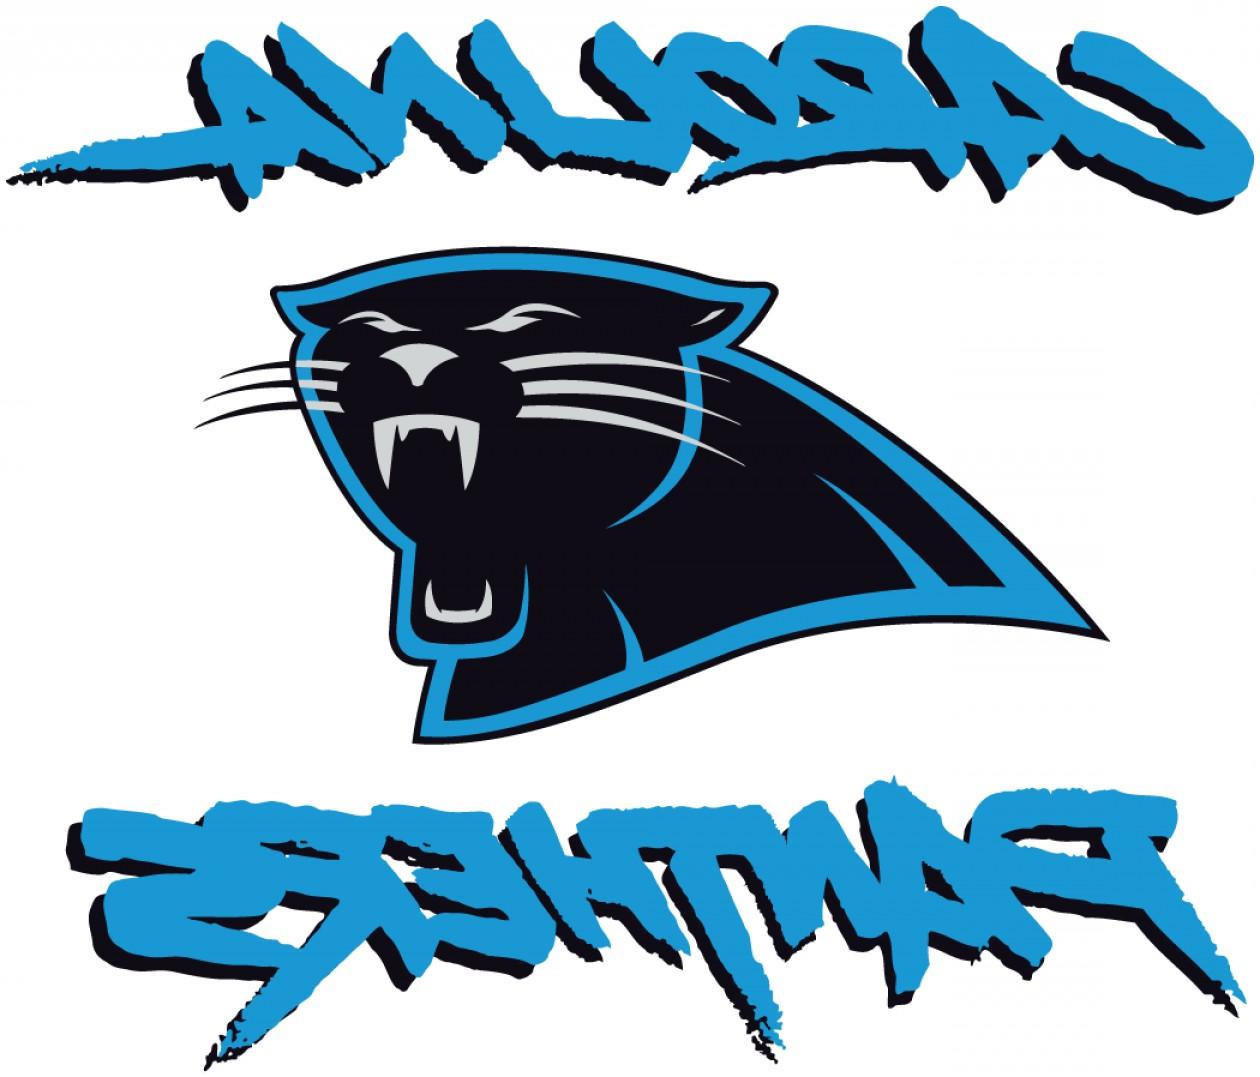 picture about Carolina Panthers Printable Logo named Carolina Panthers Drawing Free of charge down load most straightforward Carolina